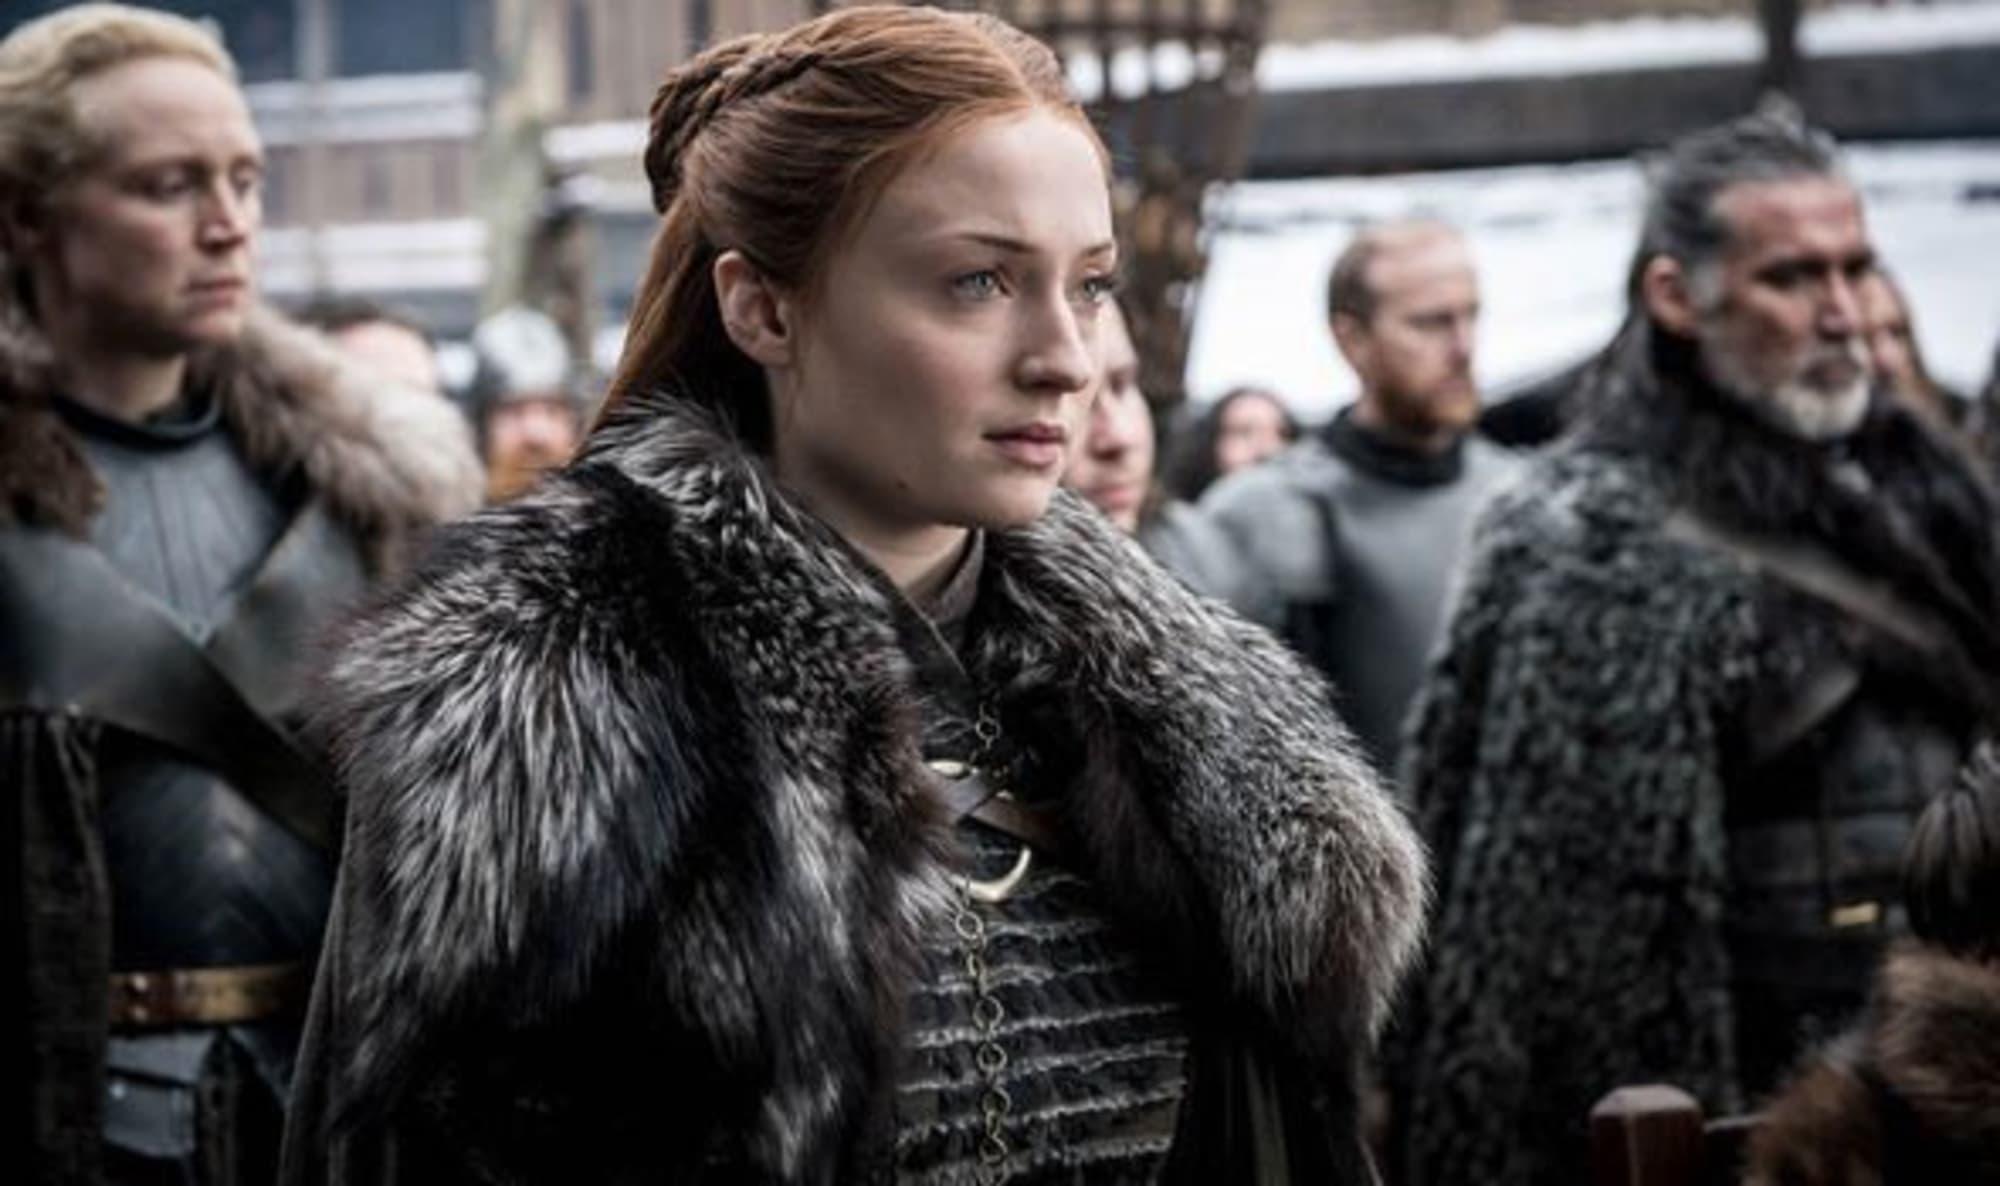 Game of Thrones star Sophie Turner dyes her hair Sansa Stark red